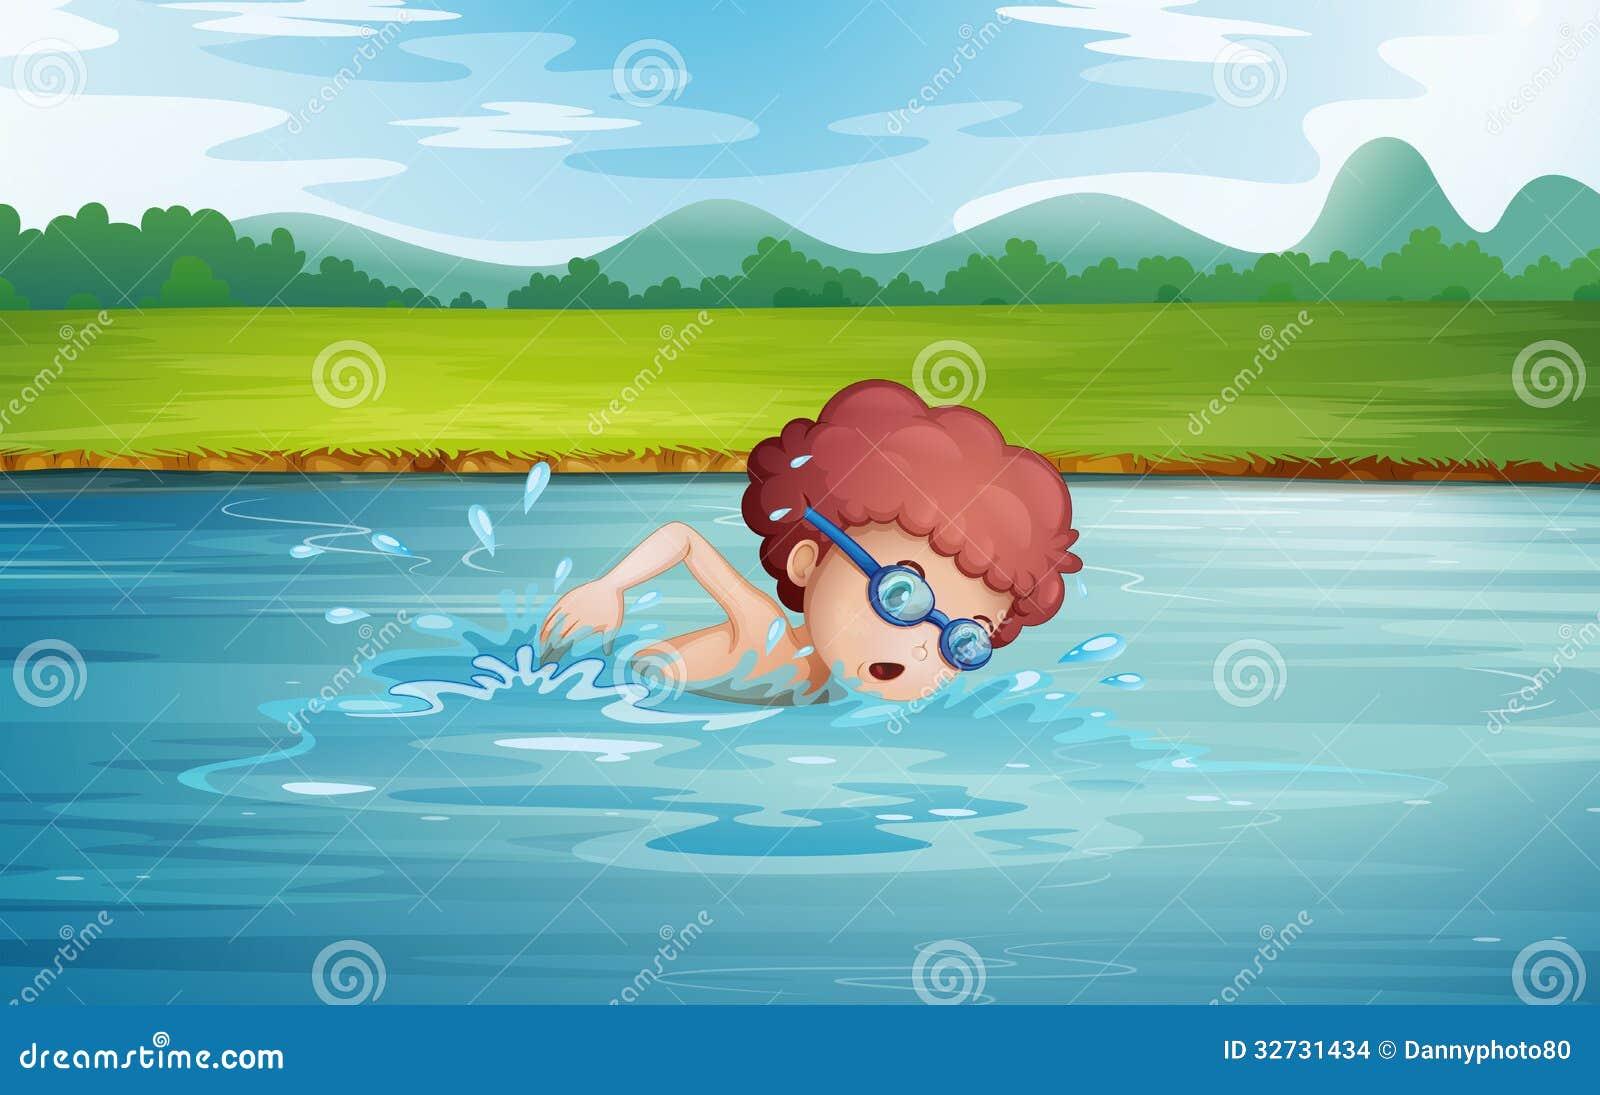 boy swimming river - photo #23